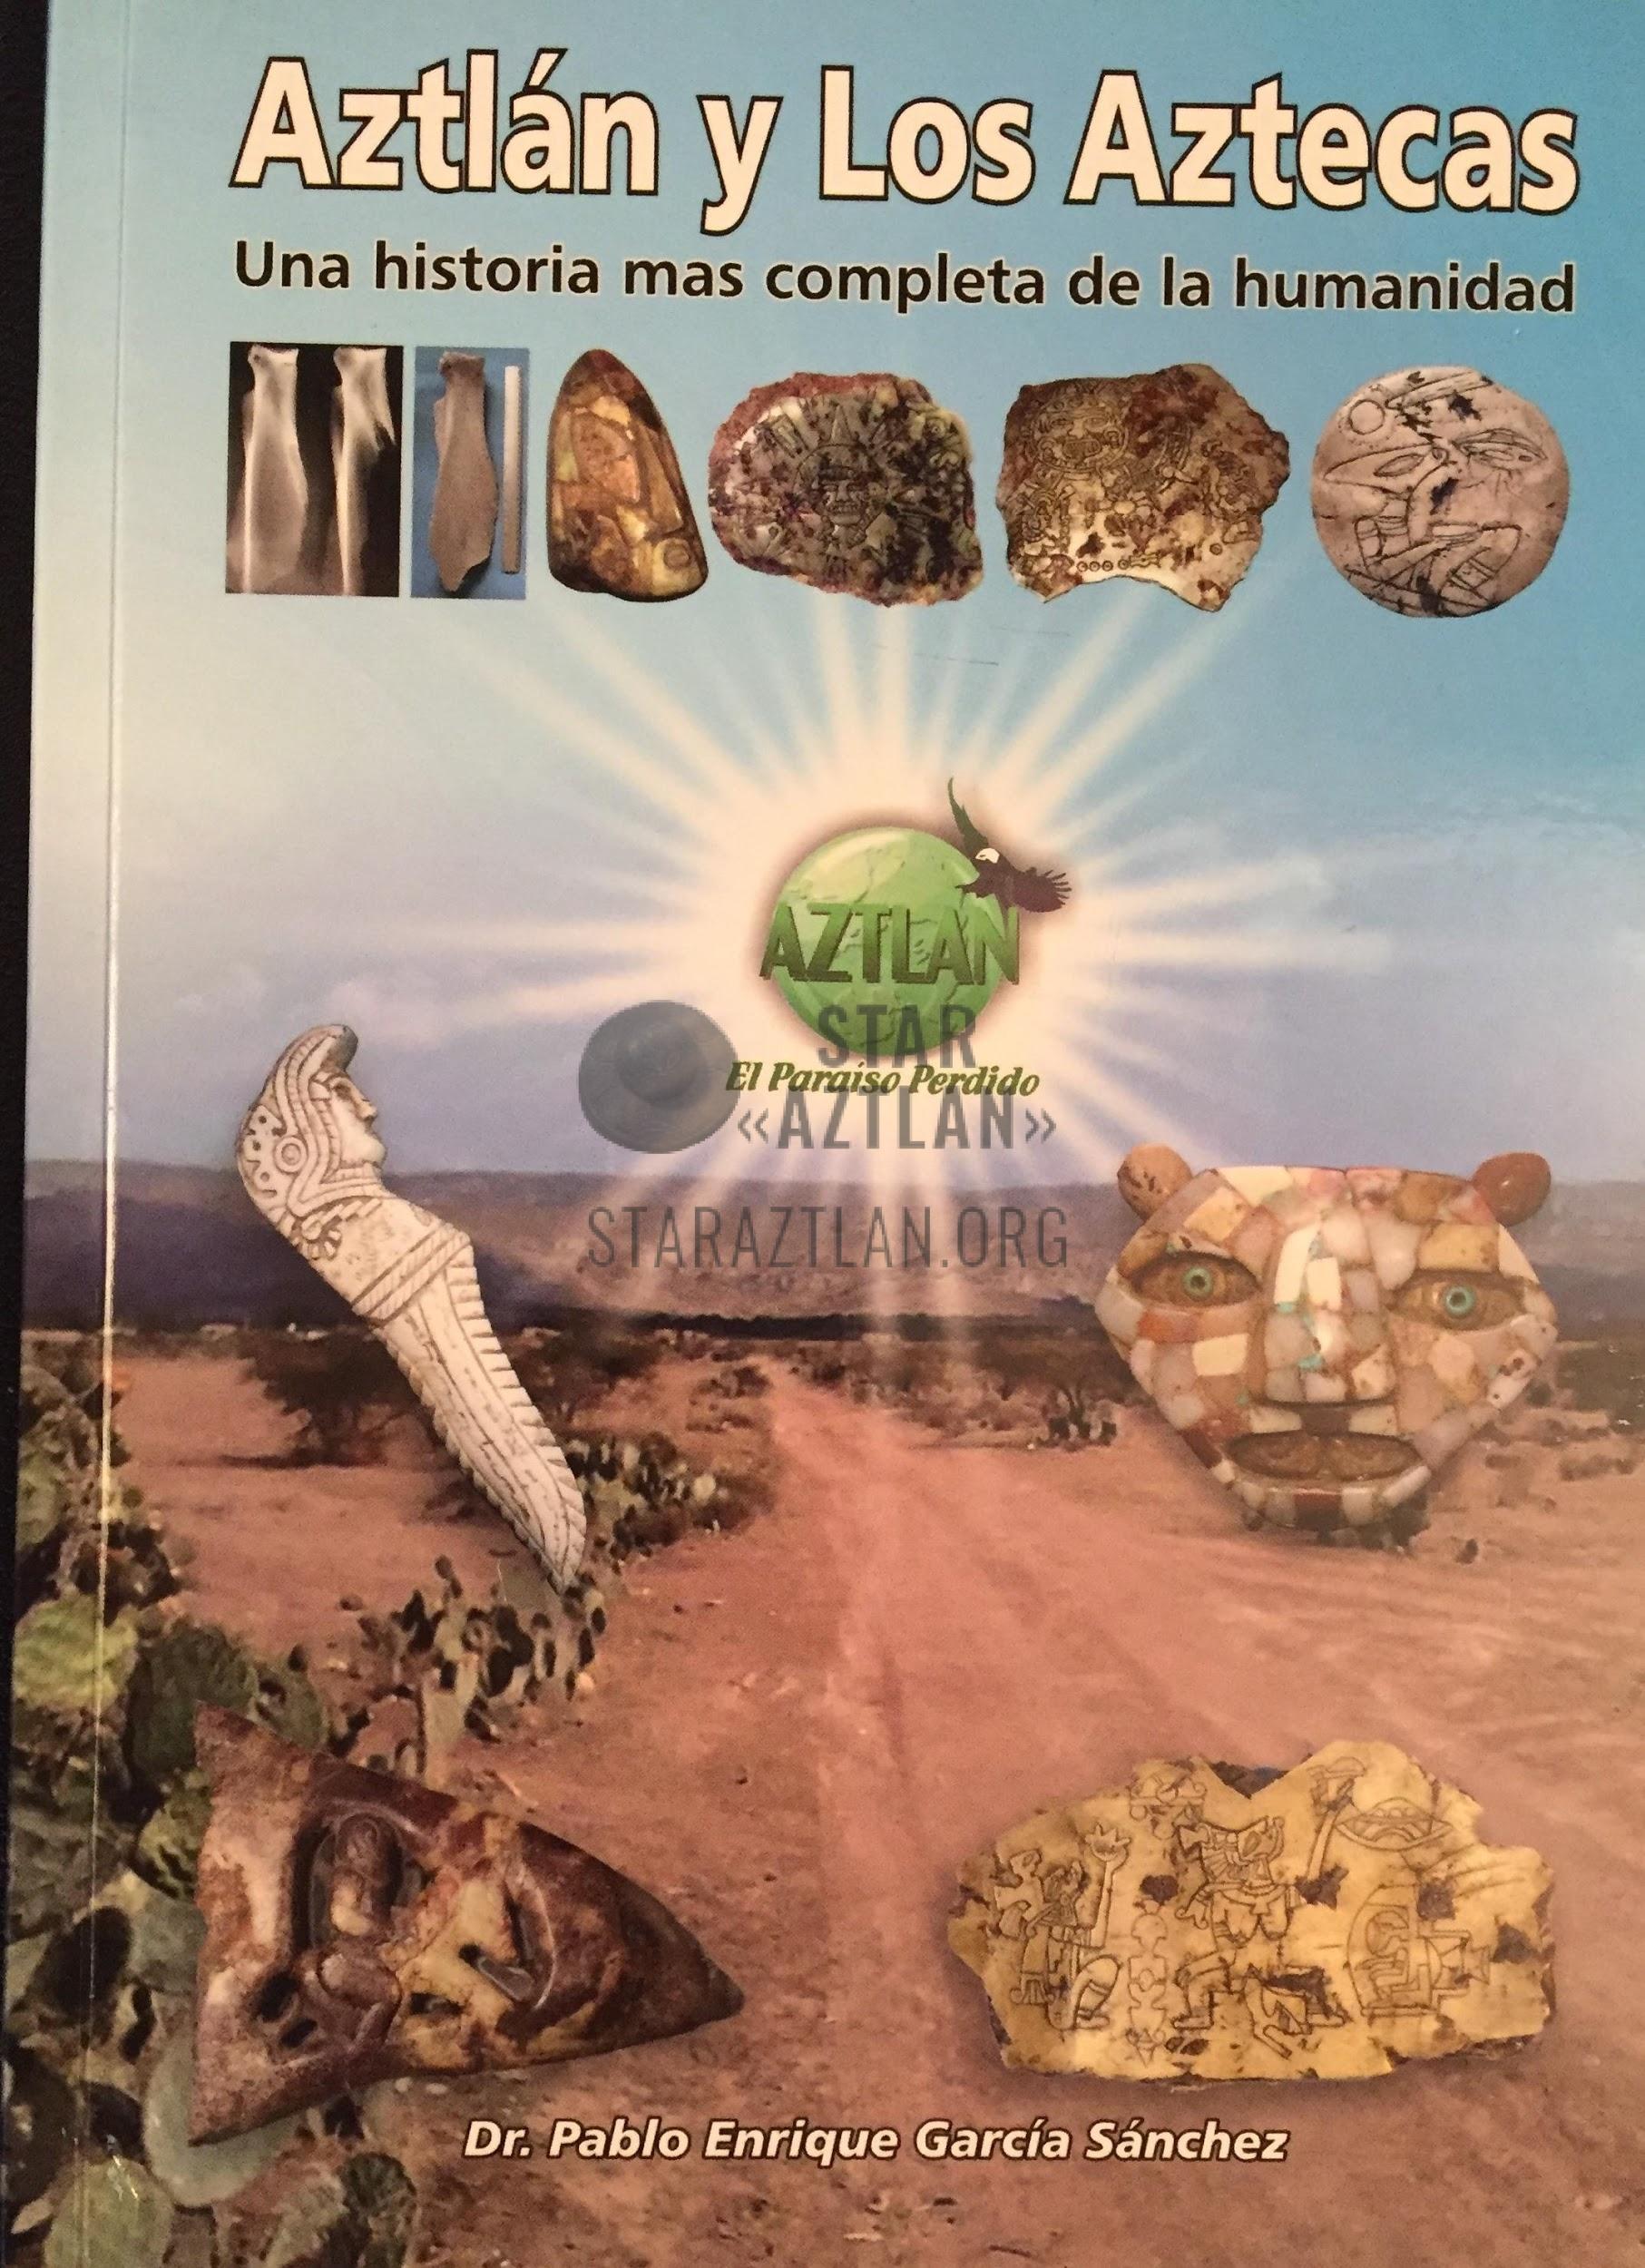 Aztlan_book/IMG_4220.JPG